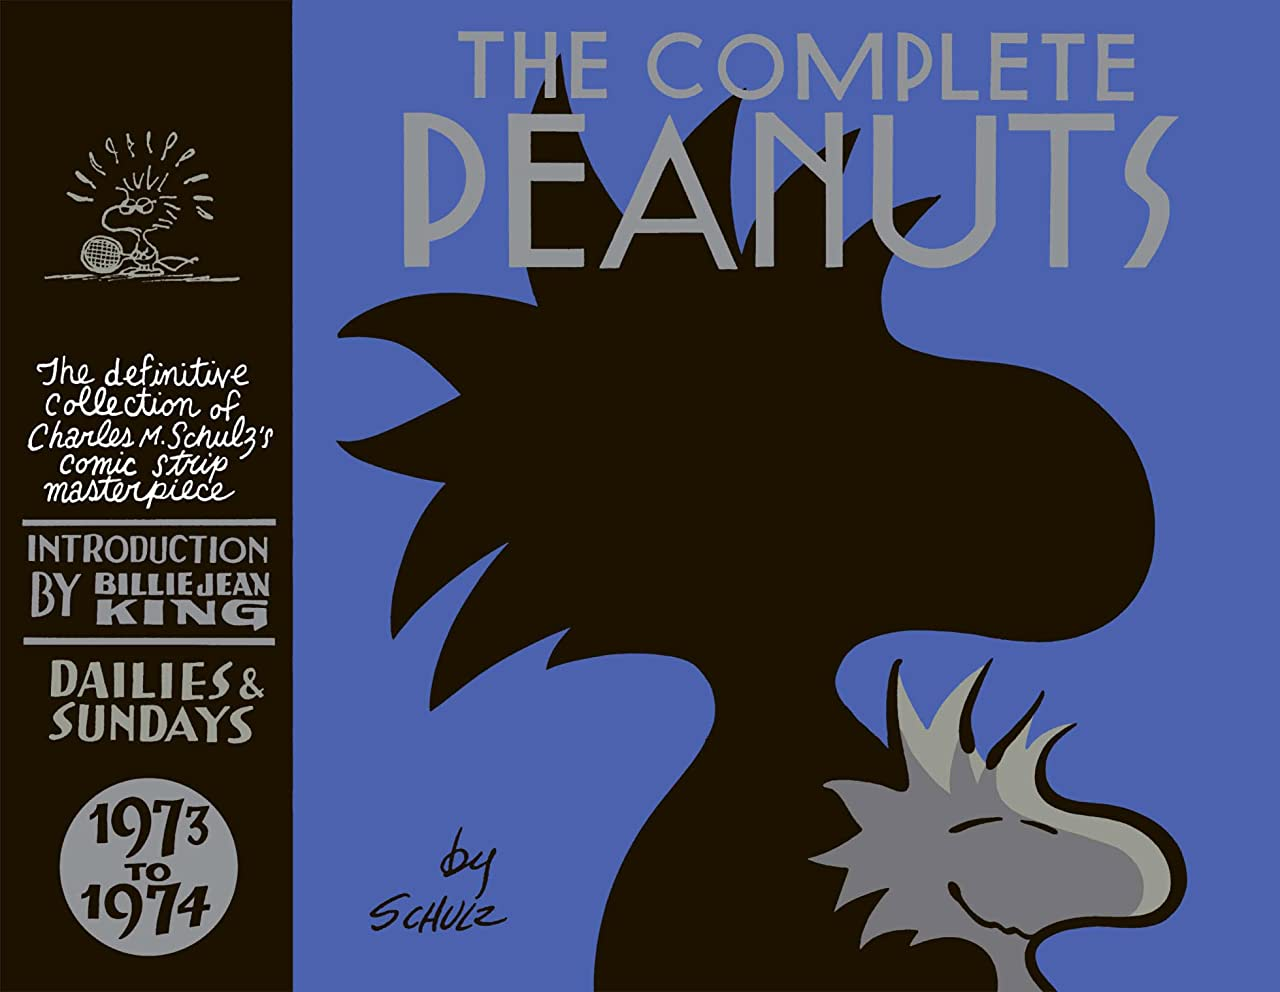 The Complete Peanuts Vol. 12: 1973-1974